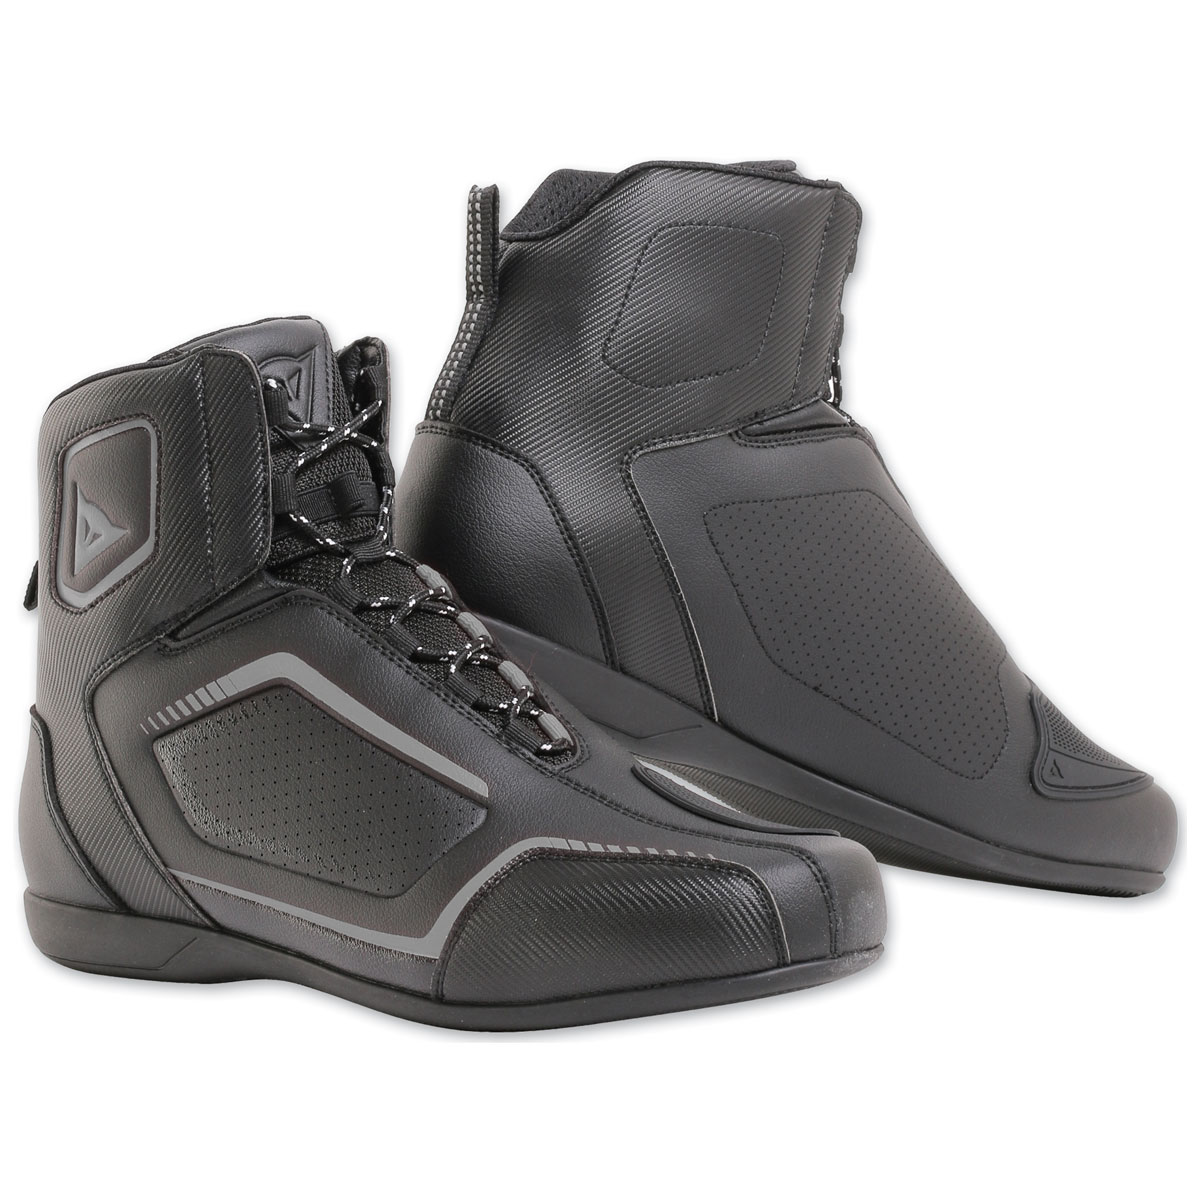 Dainese Men's Raptors Air Black/Anthracite Shoes